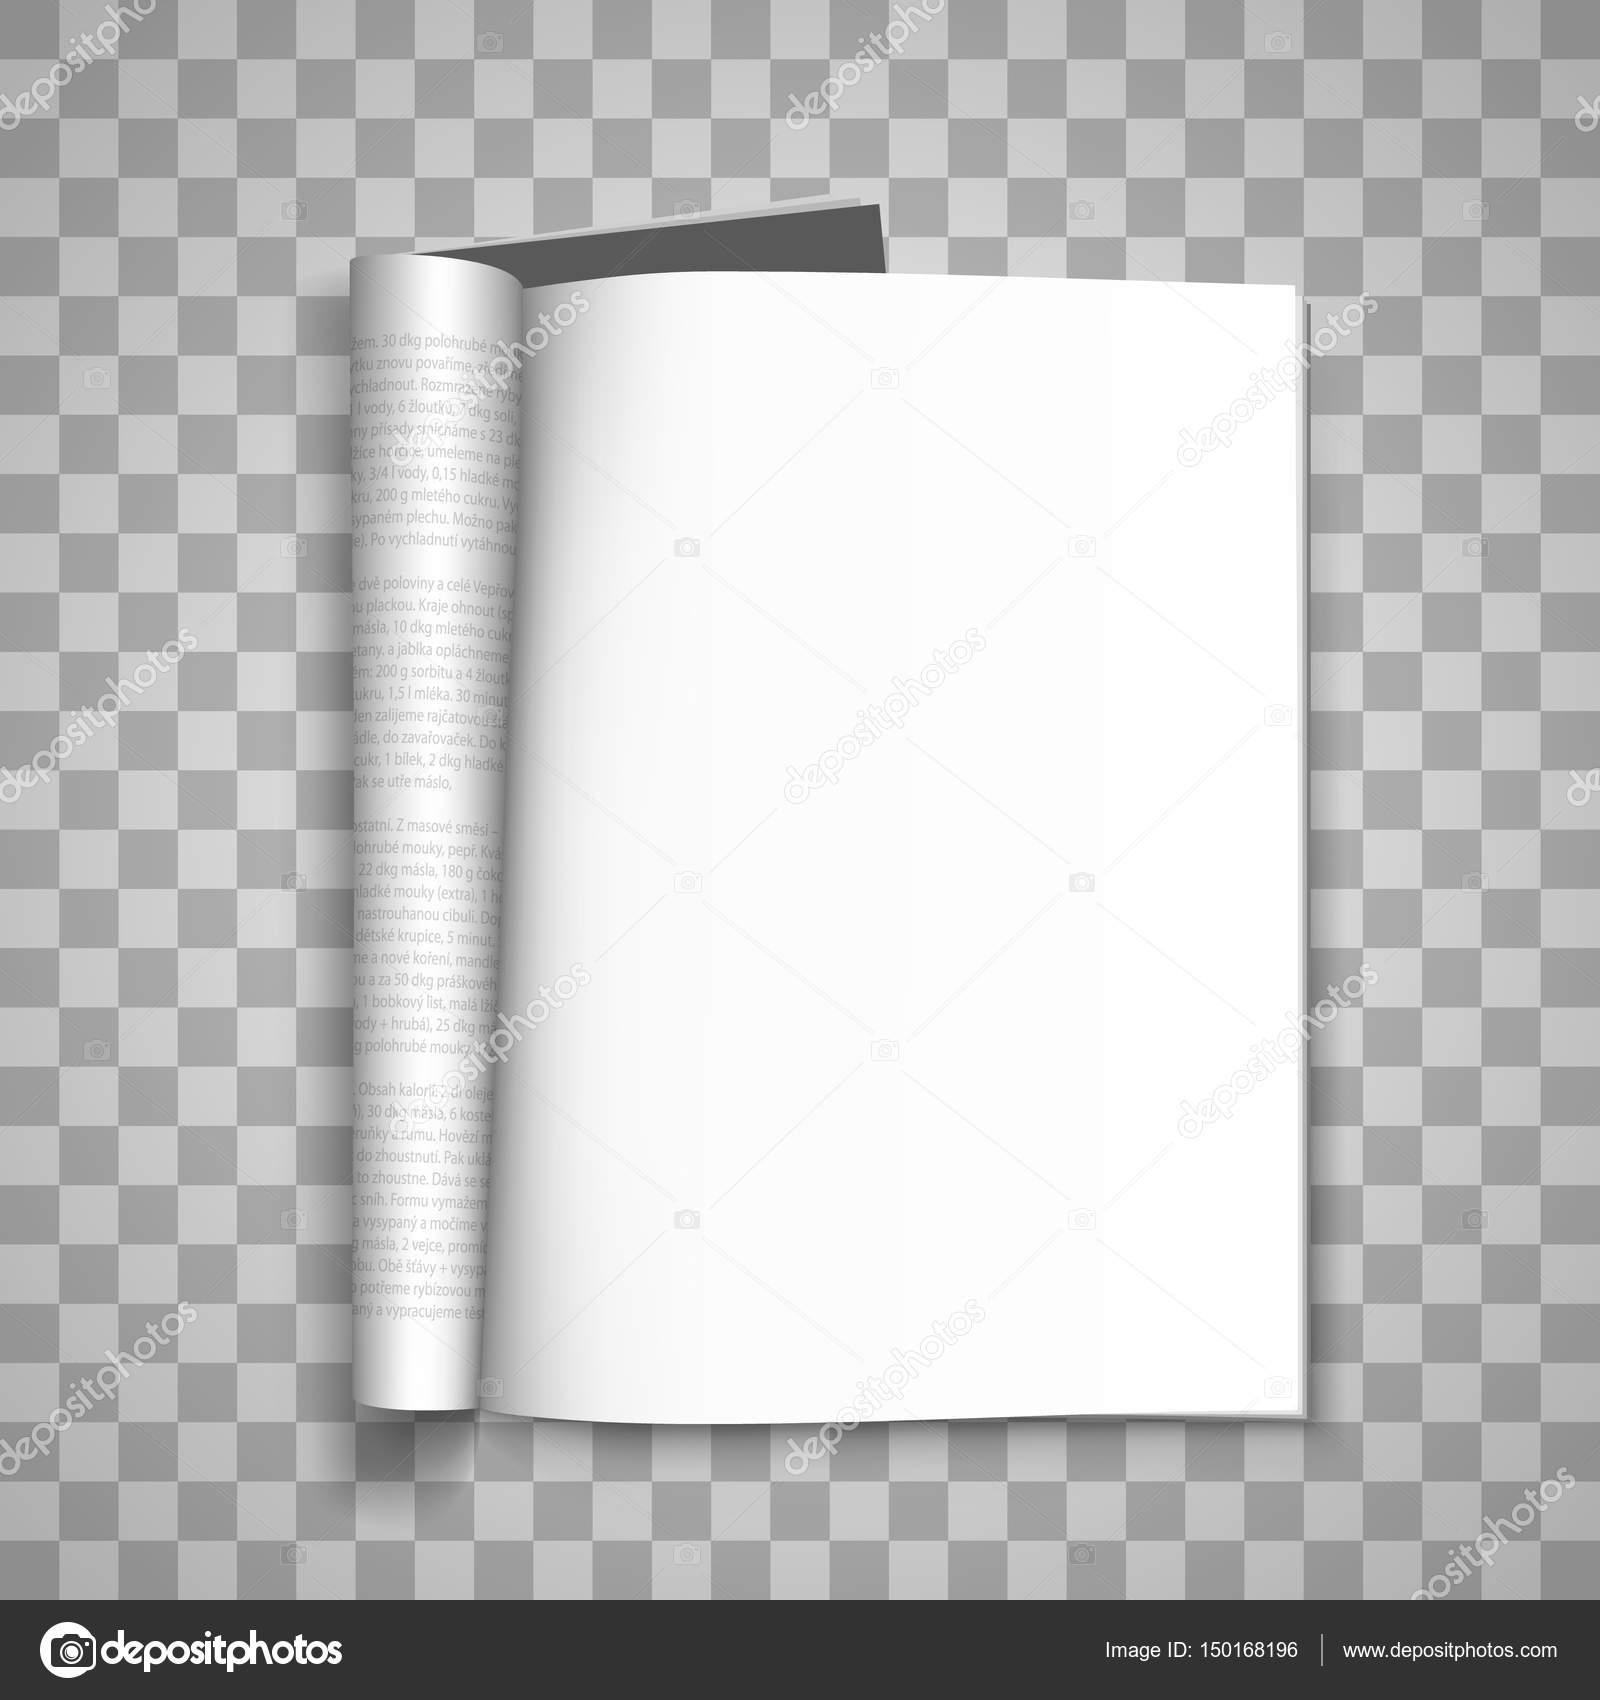 fabuleux fond papier journal nq66 humatraffin. Black Bedroom Furniture Sets. Home Design Ideas